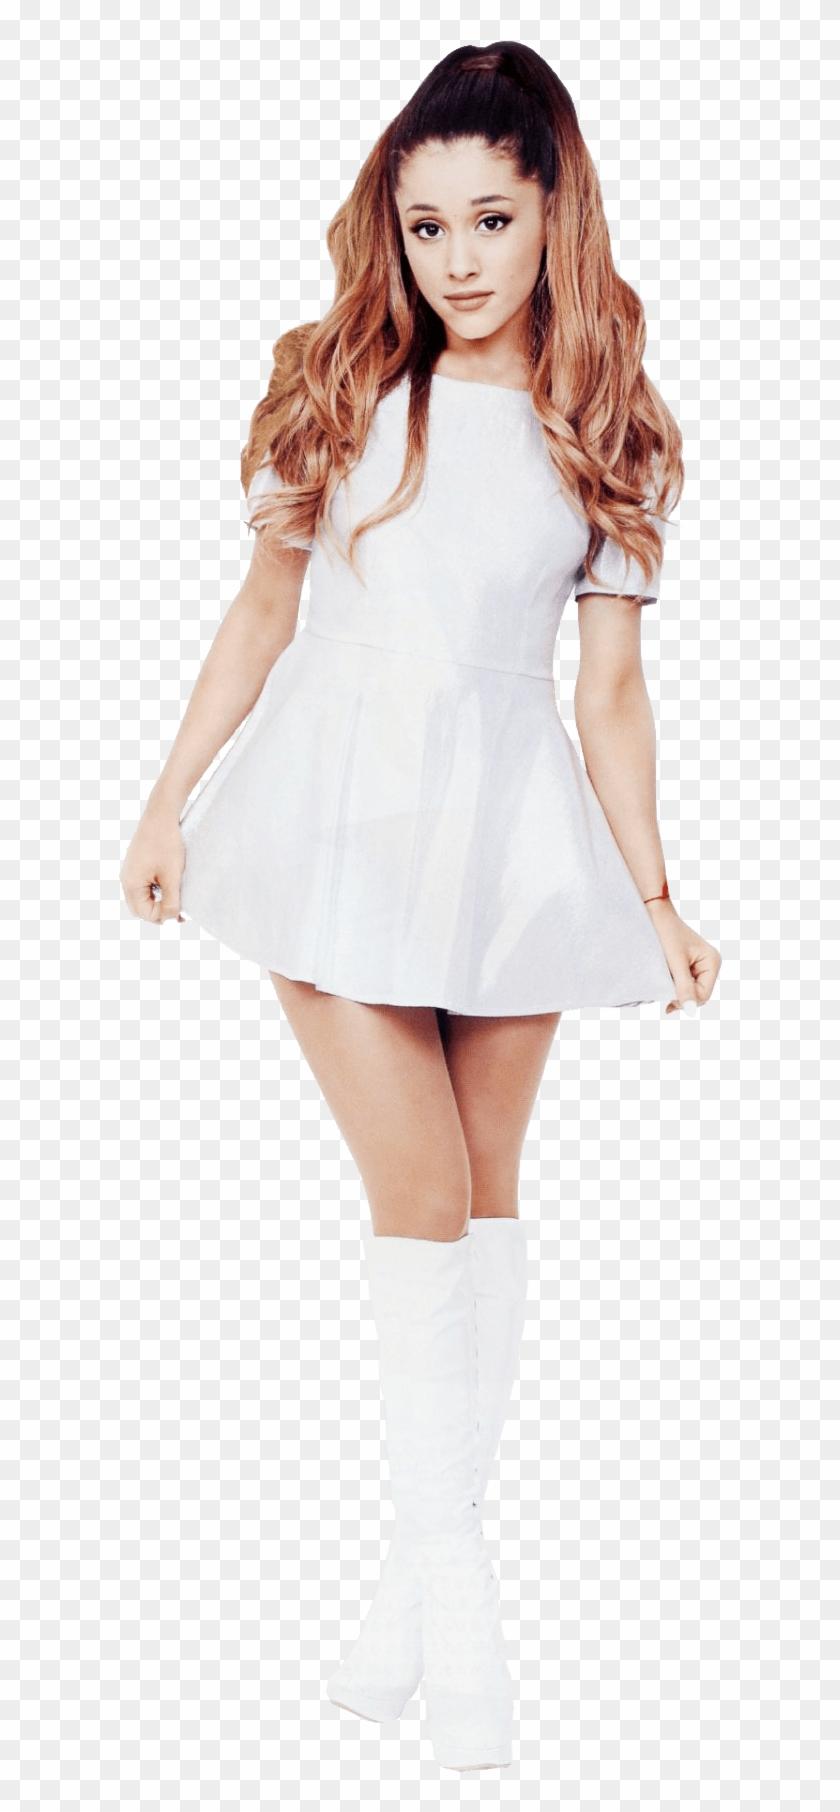 Ariana Grande Clipart Black And White Ariana Grande Japan